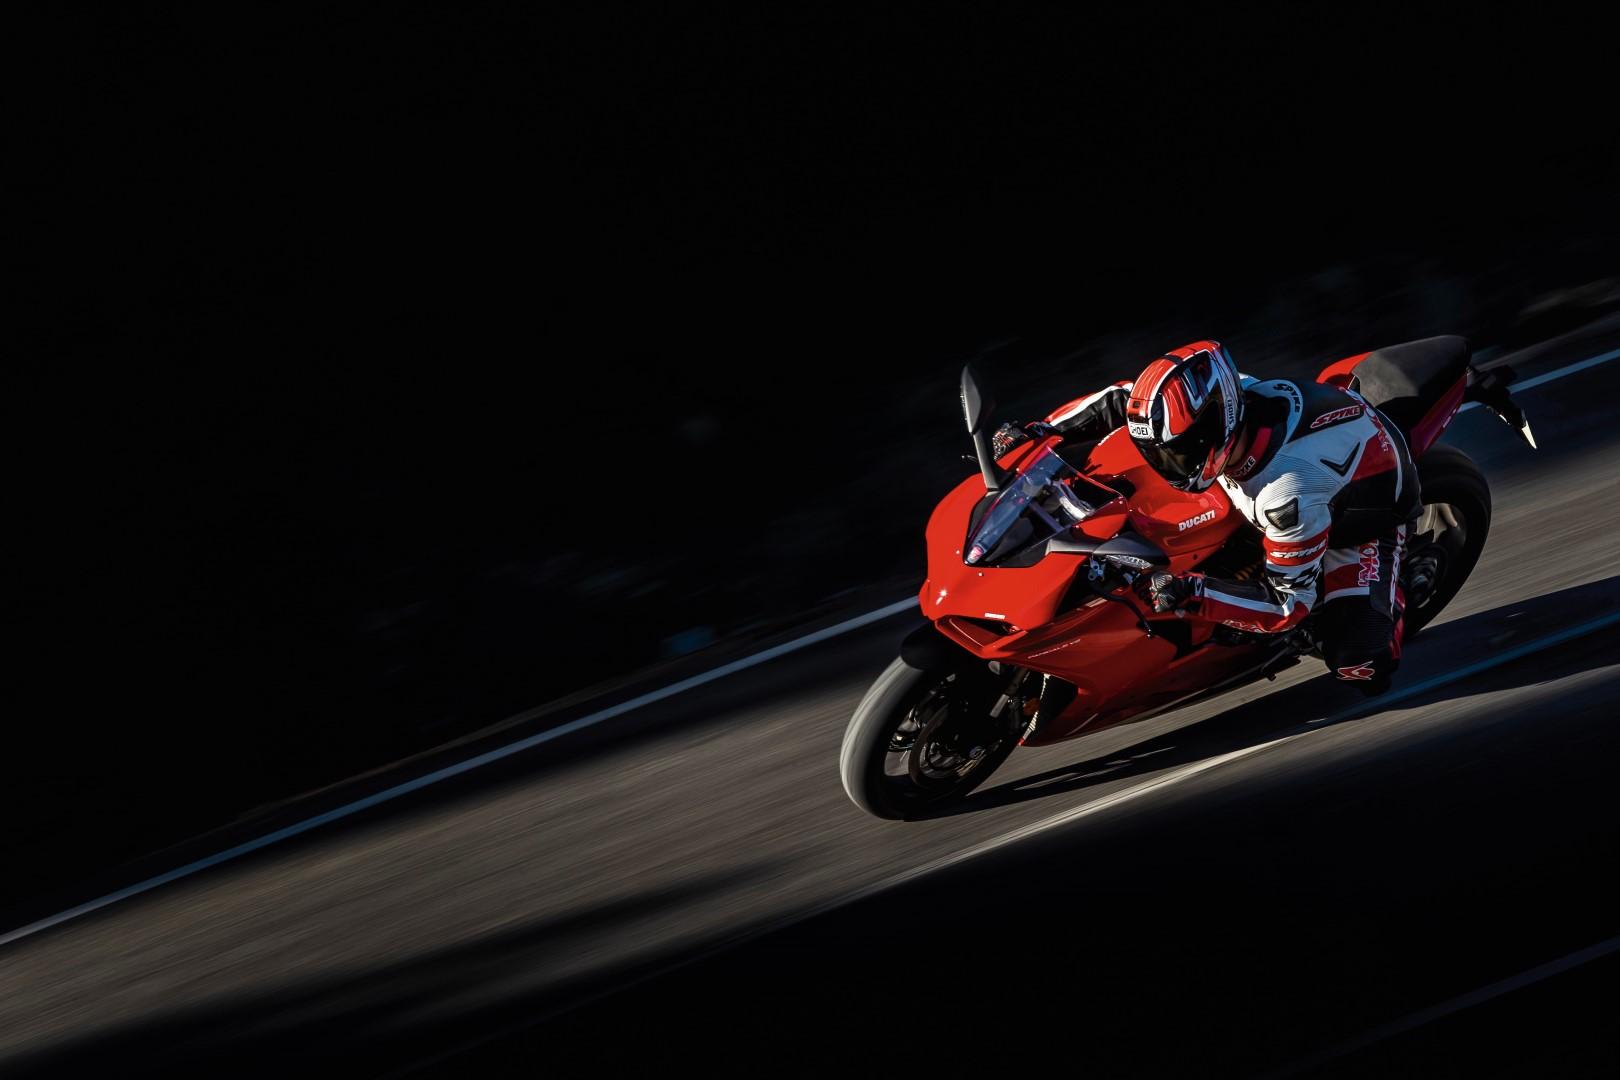 Ducati Panigale V2, superprueba, fotos y ficha técnica